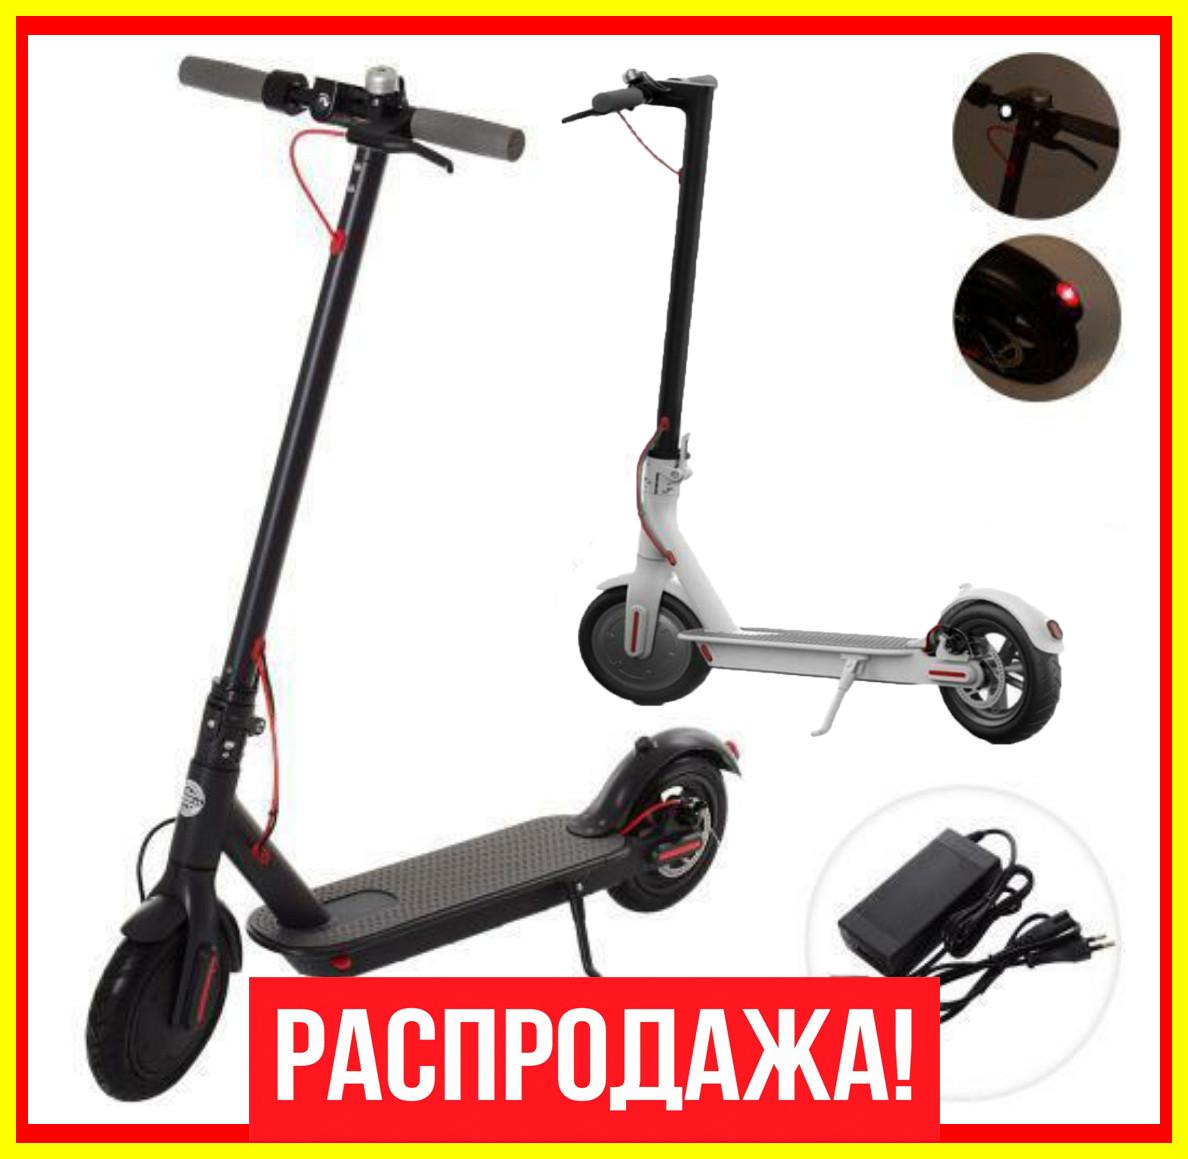 Електросамокат KUGOO E-scooter M365 PRO Max, додаток Чорний, Білий